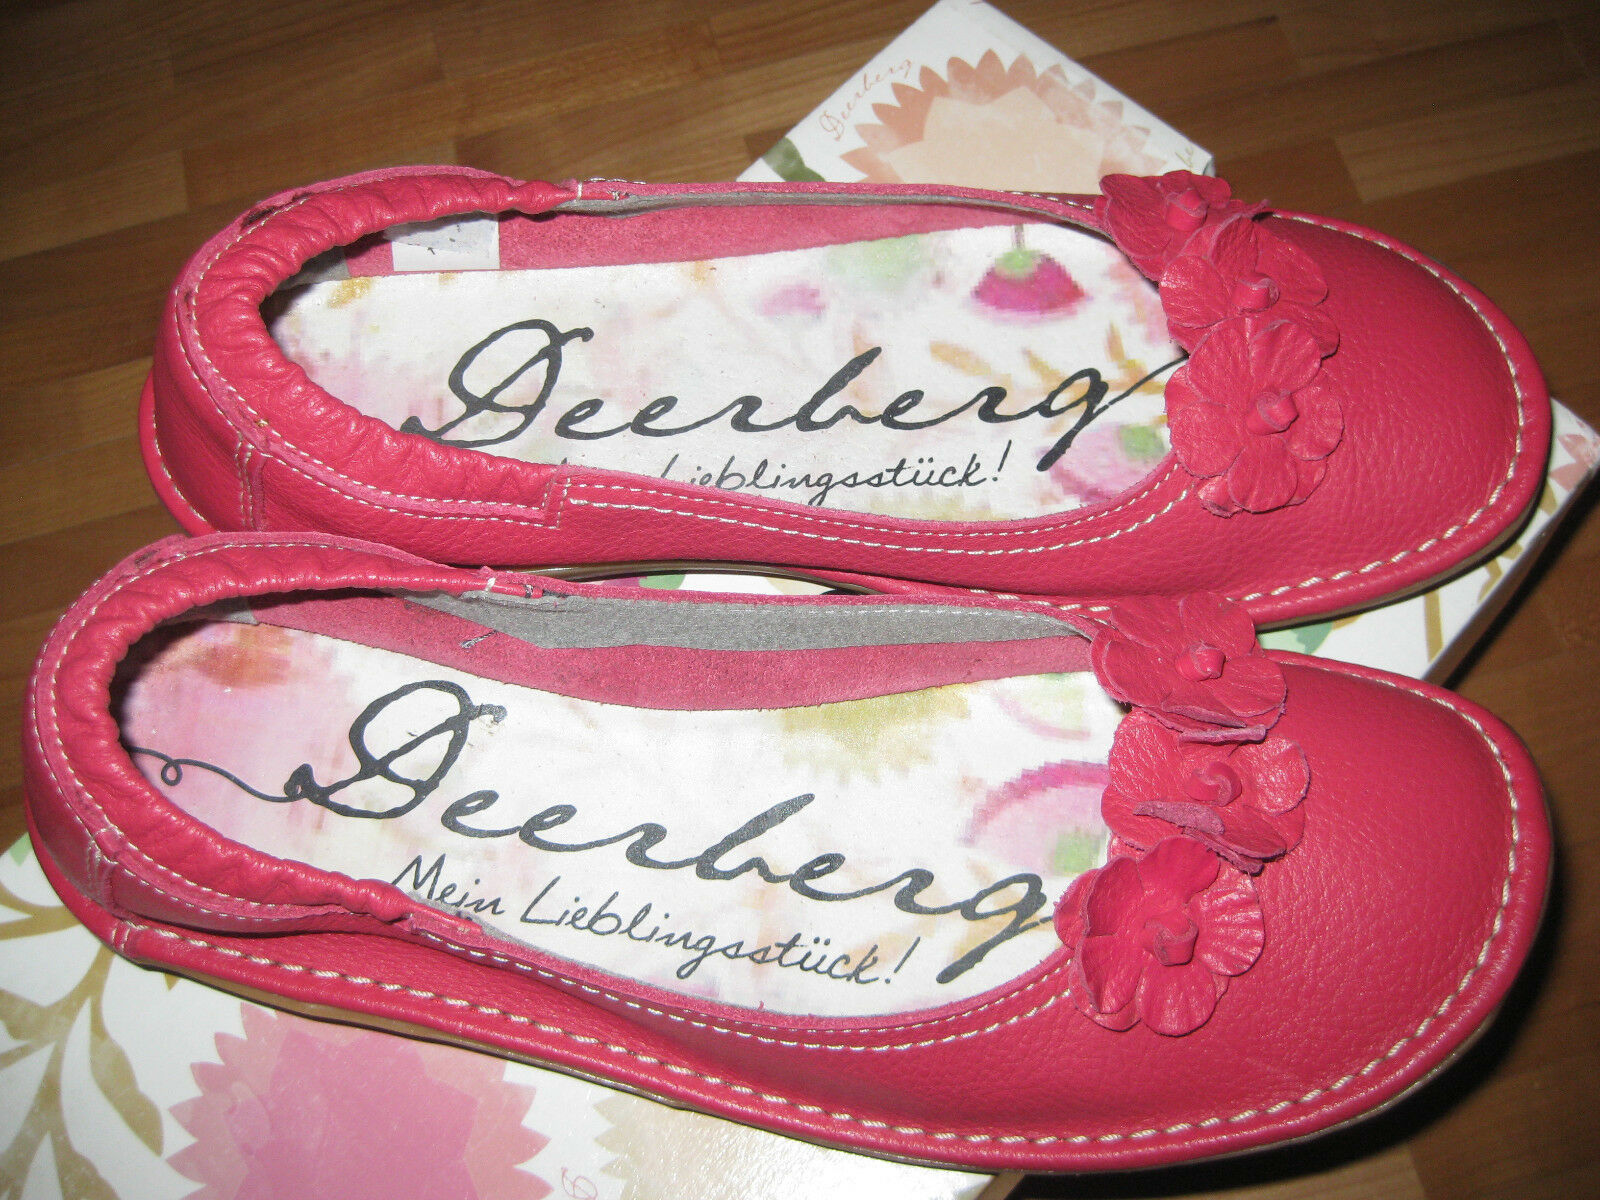 Deerberg Ballerina, rot, Blüten,  Gr. 38 neu, Leder 50 Euro